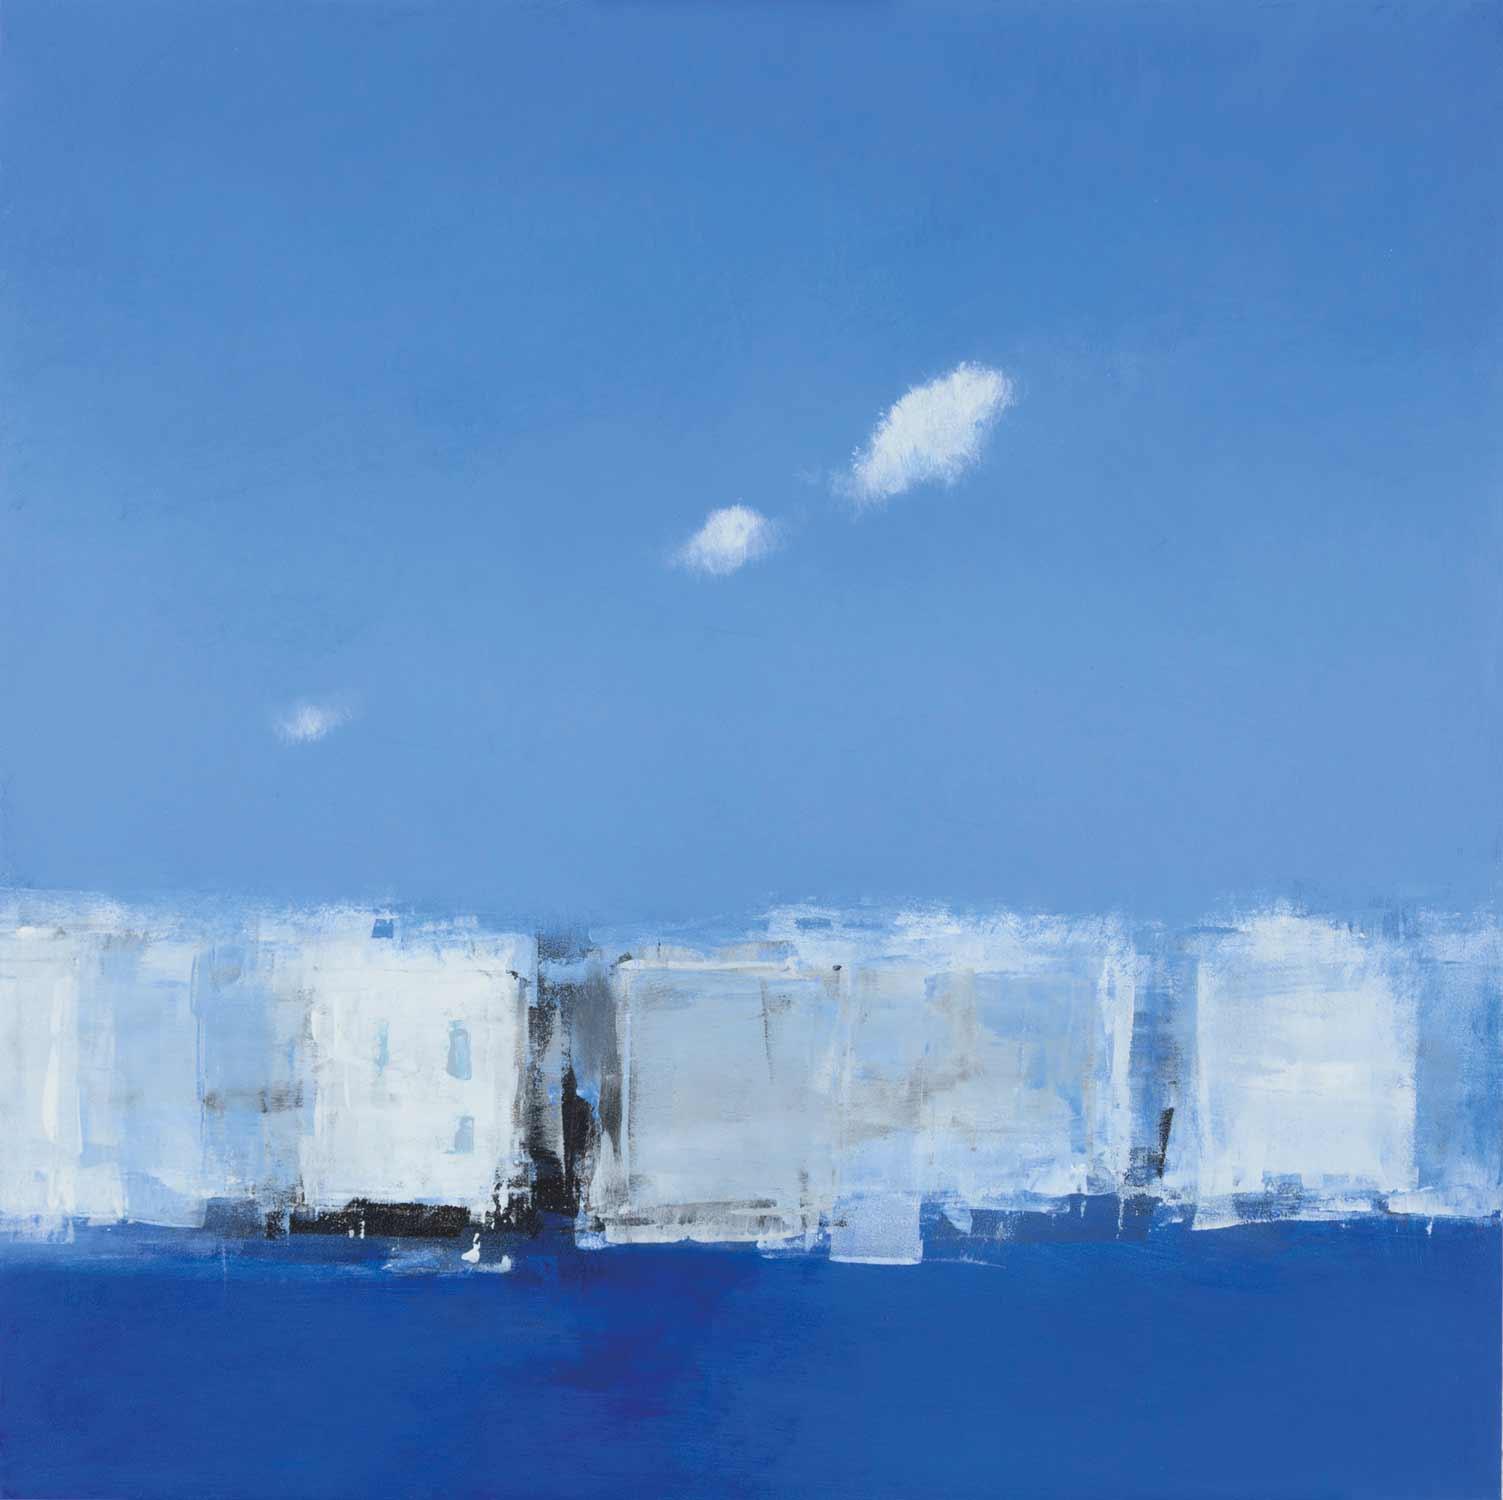 http://neilcanning.com/wp-content/uploads/sites/3/2017/03/08-Blue-Harbour.jpg